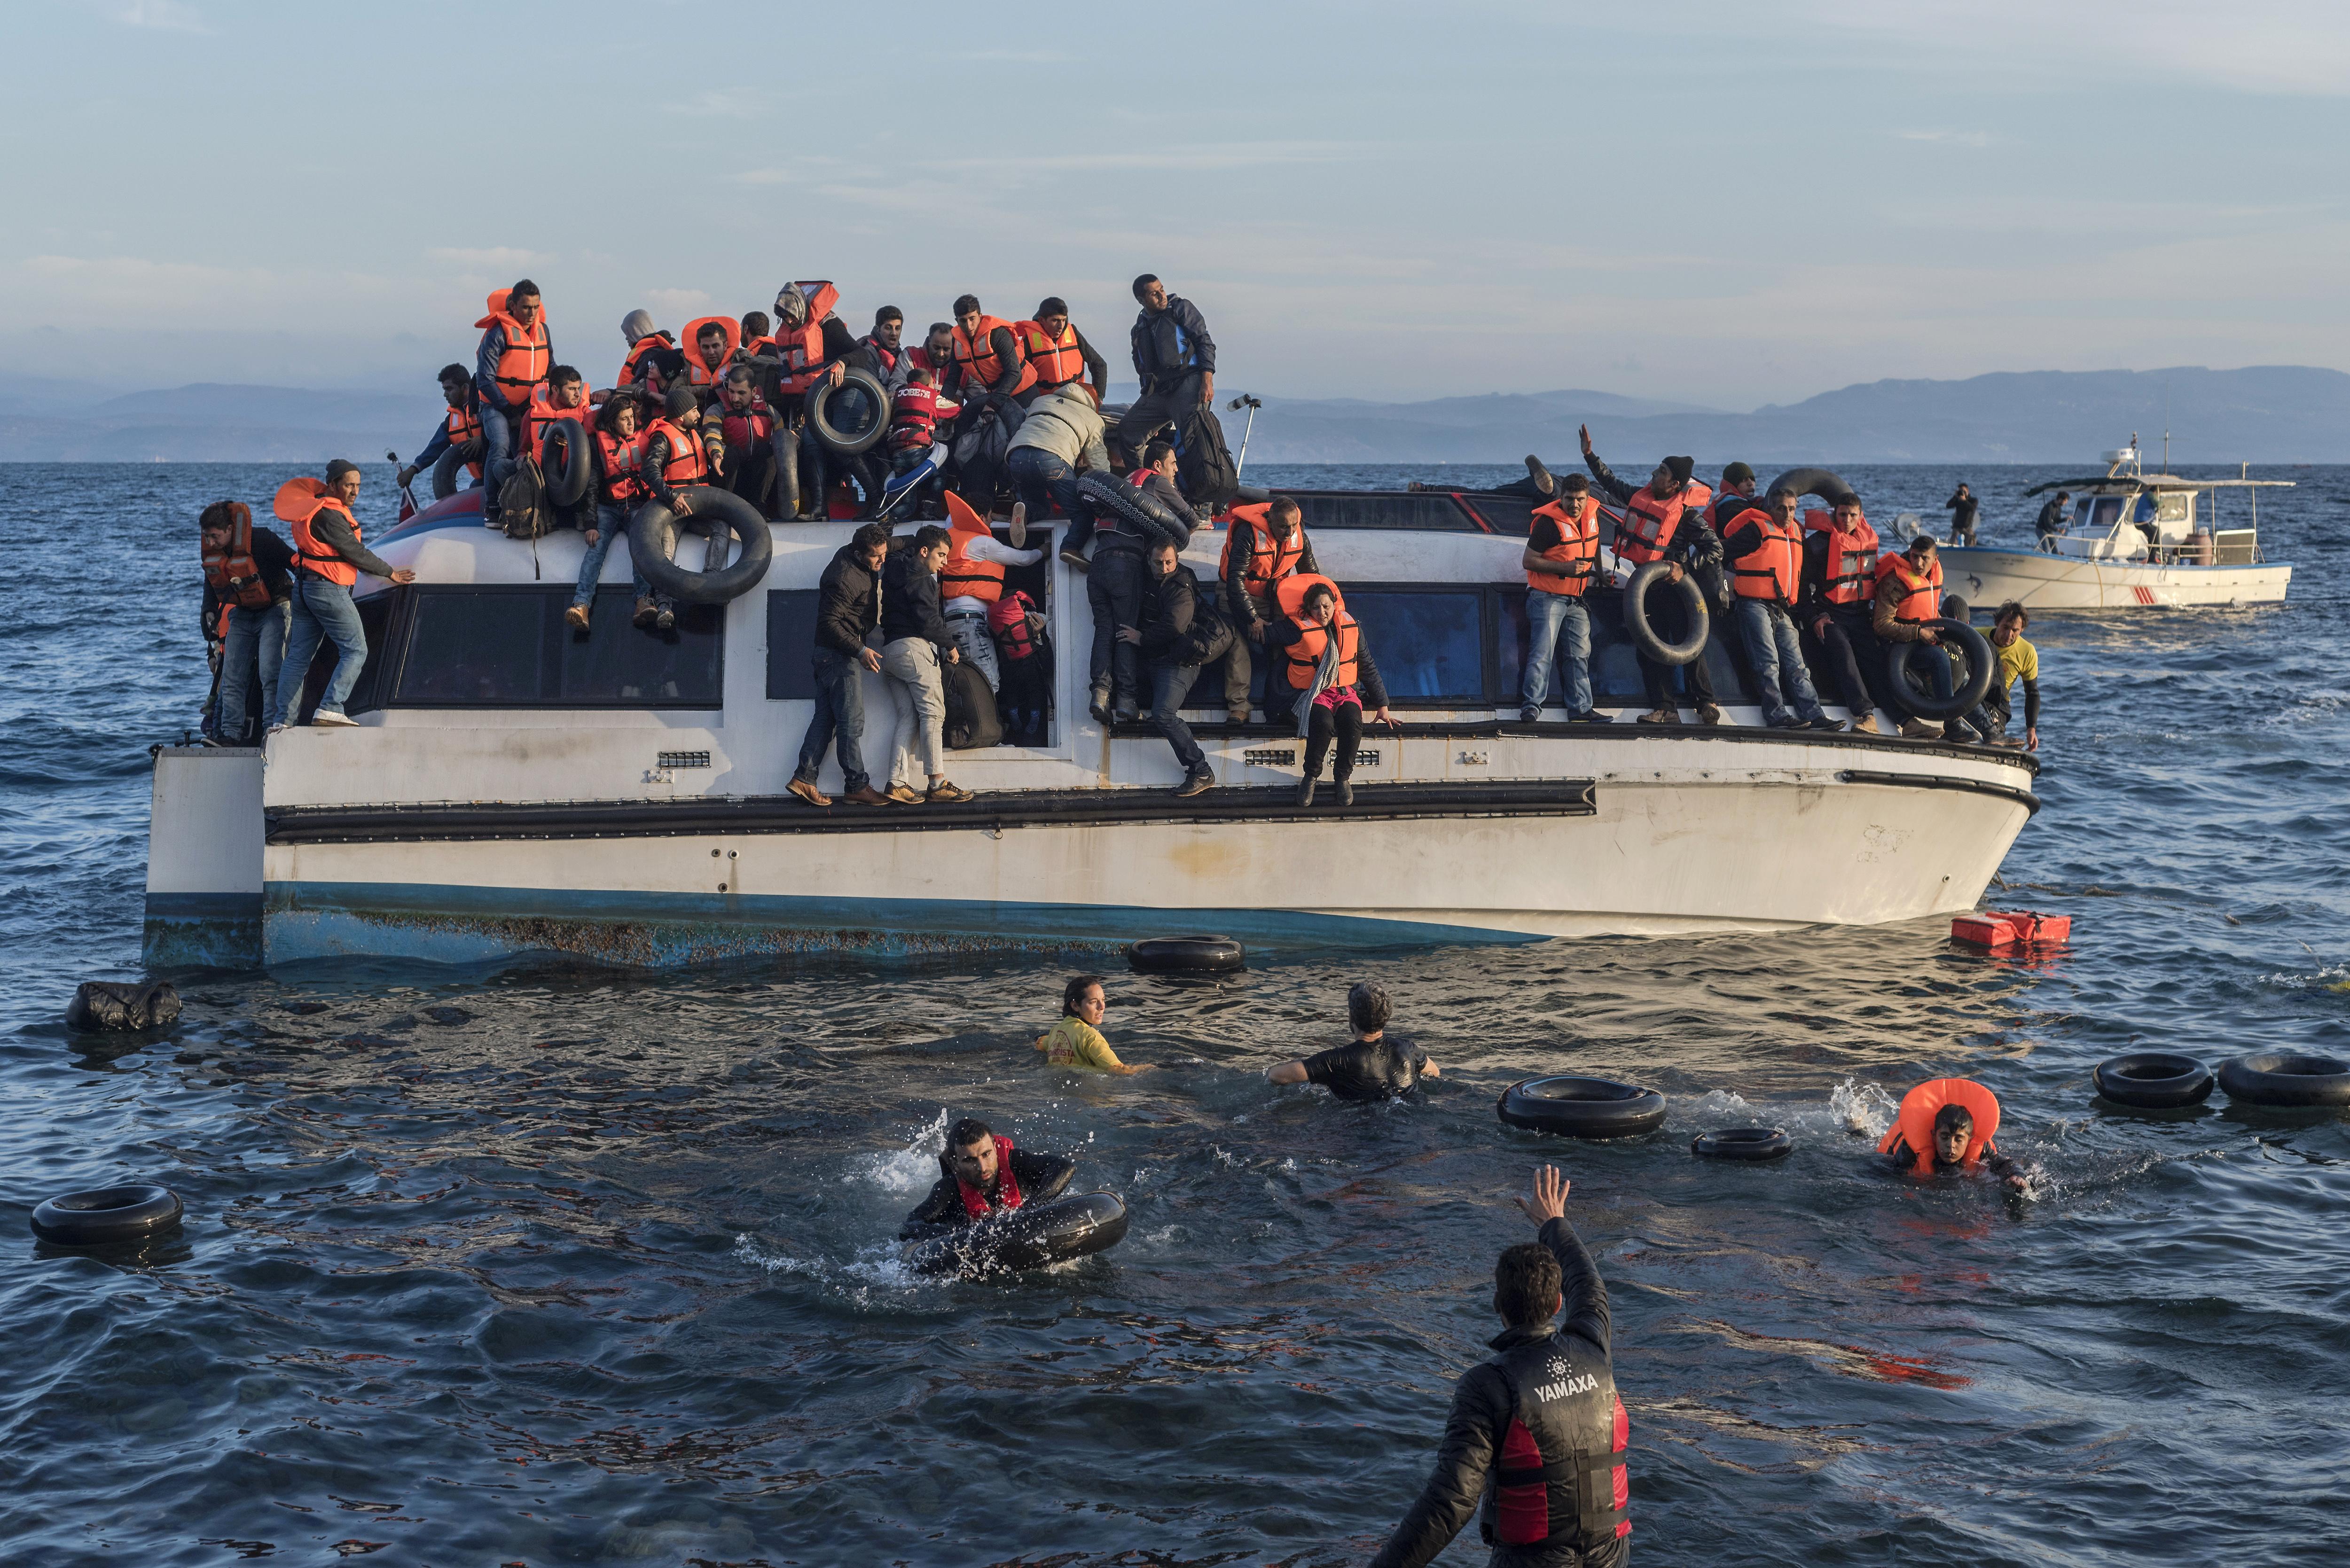 Australia to review new refugee legislation